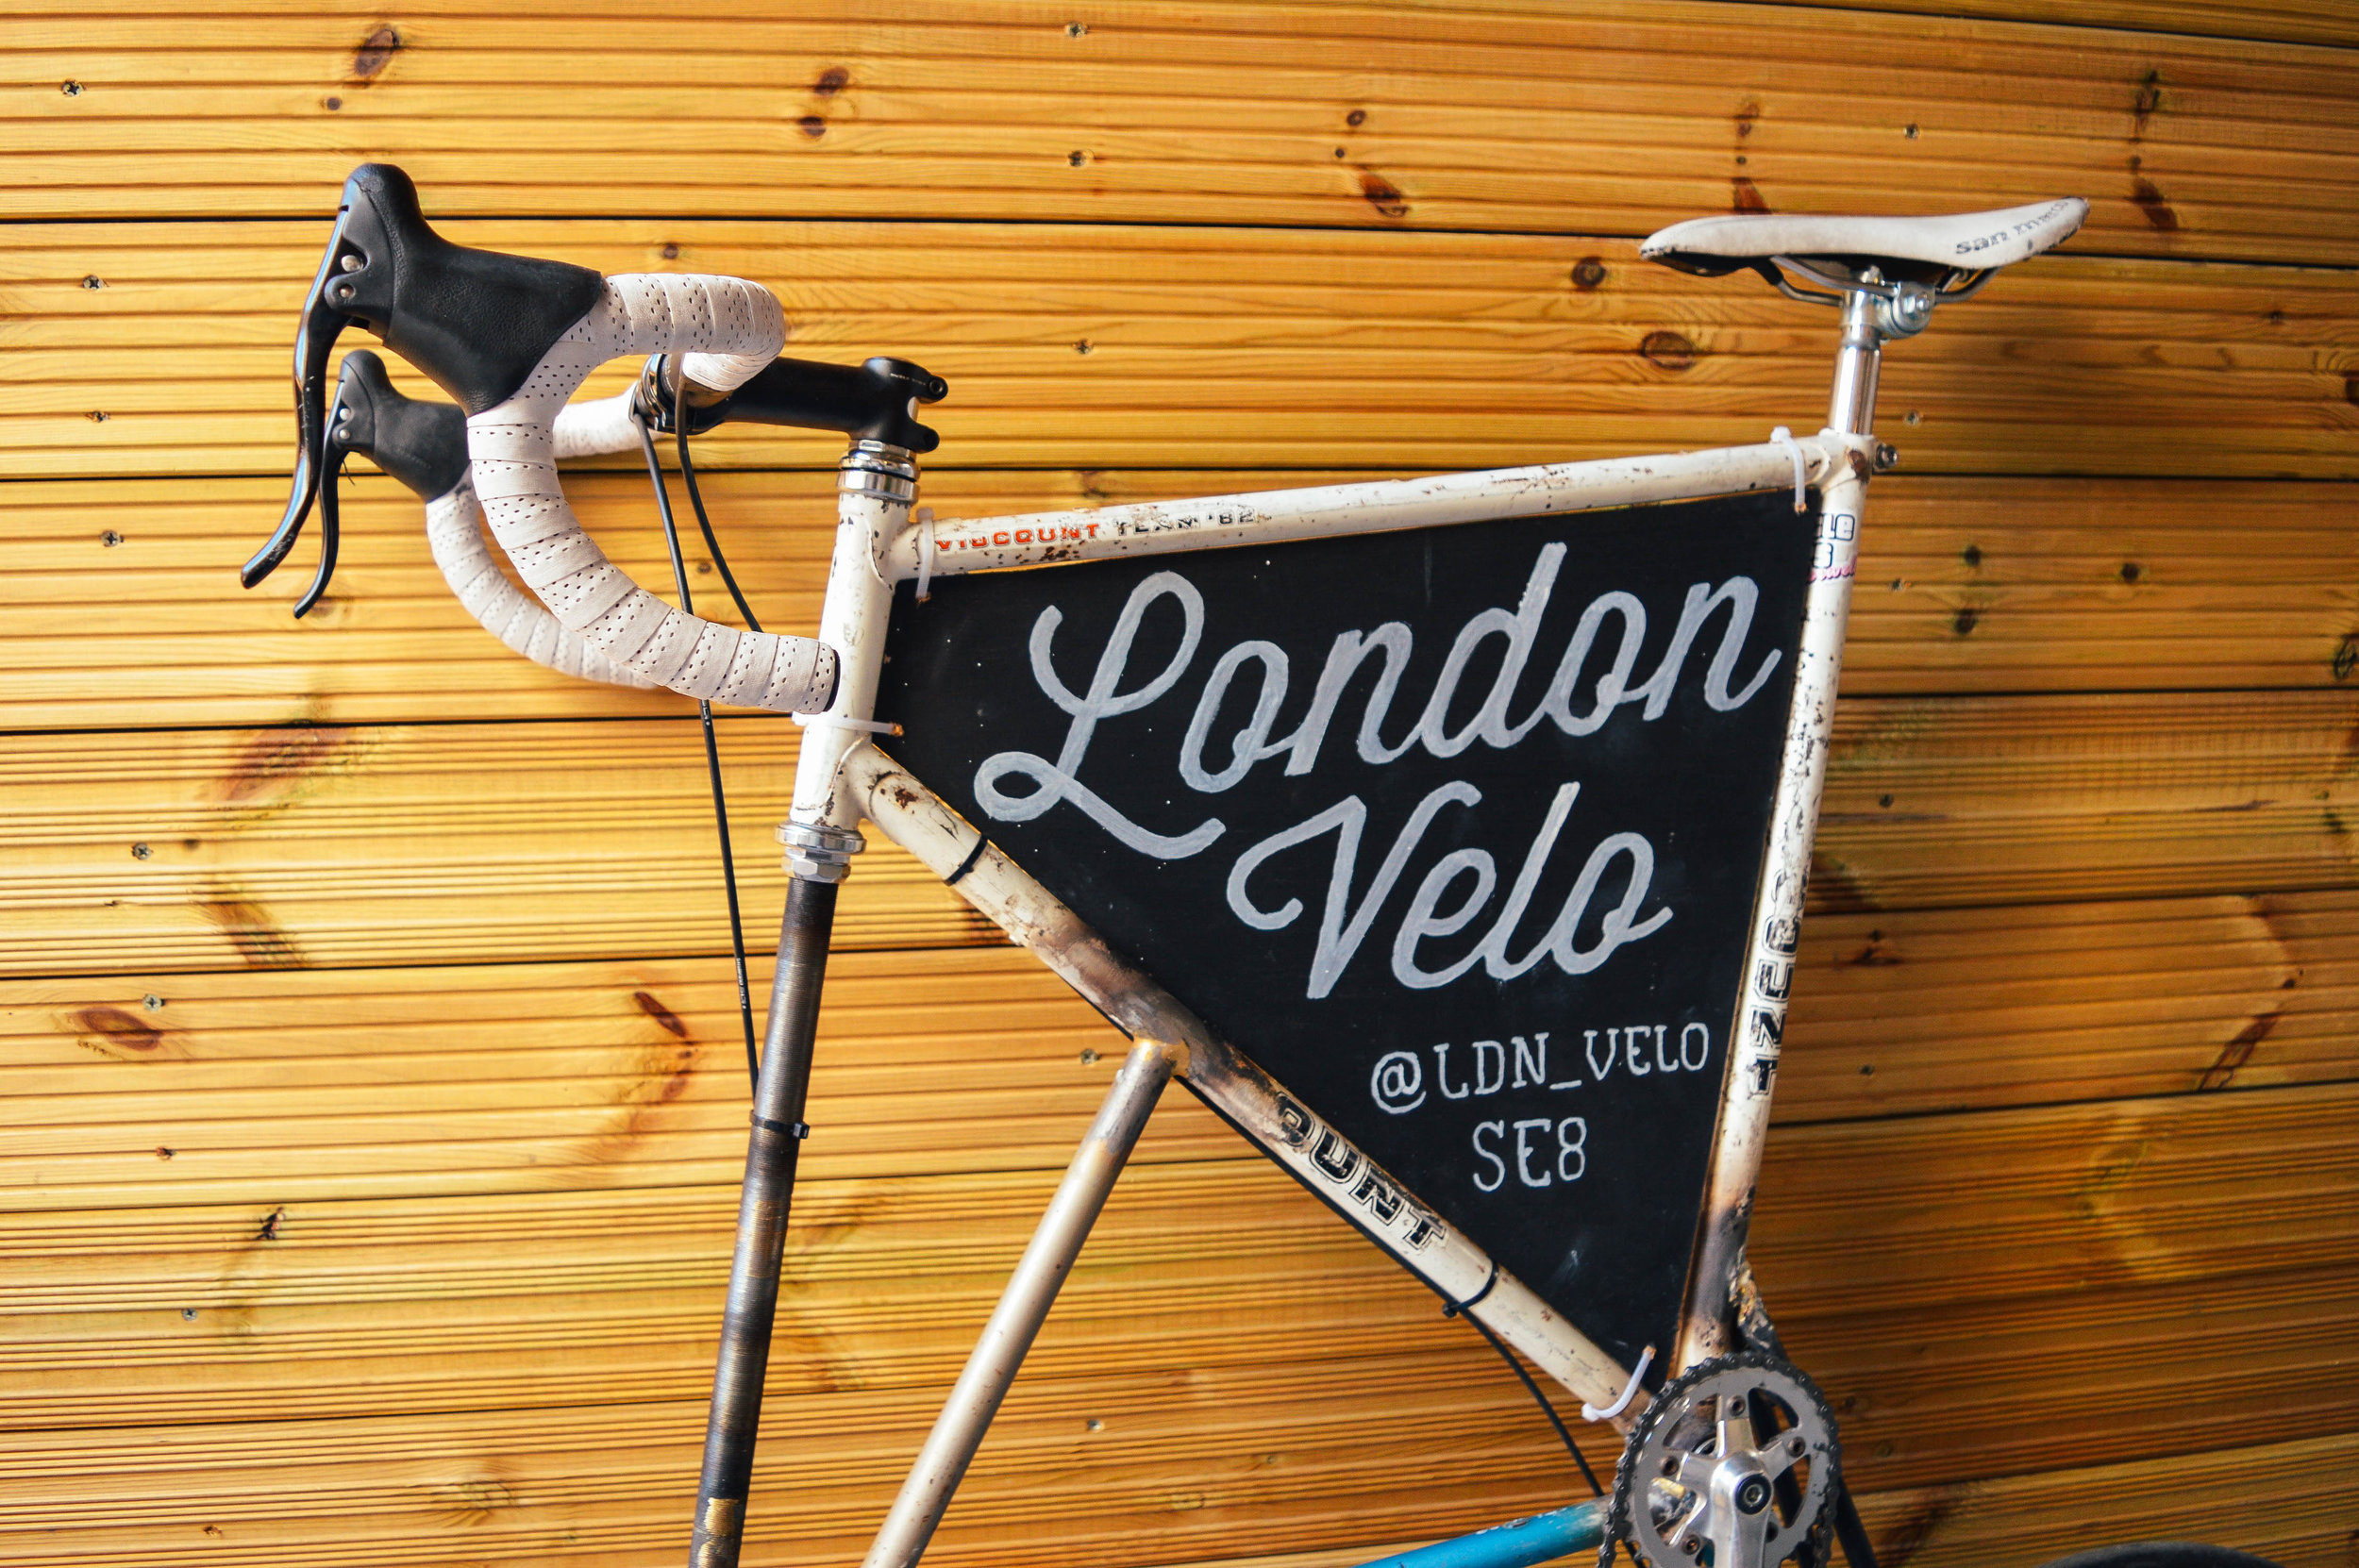 London Velo London Voyage Collective Fi McCrindle